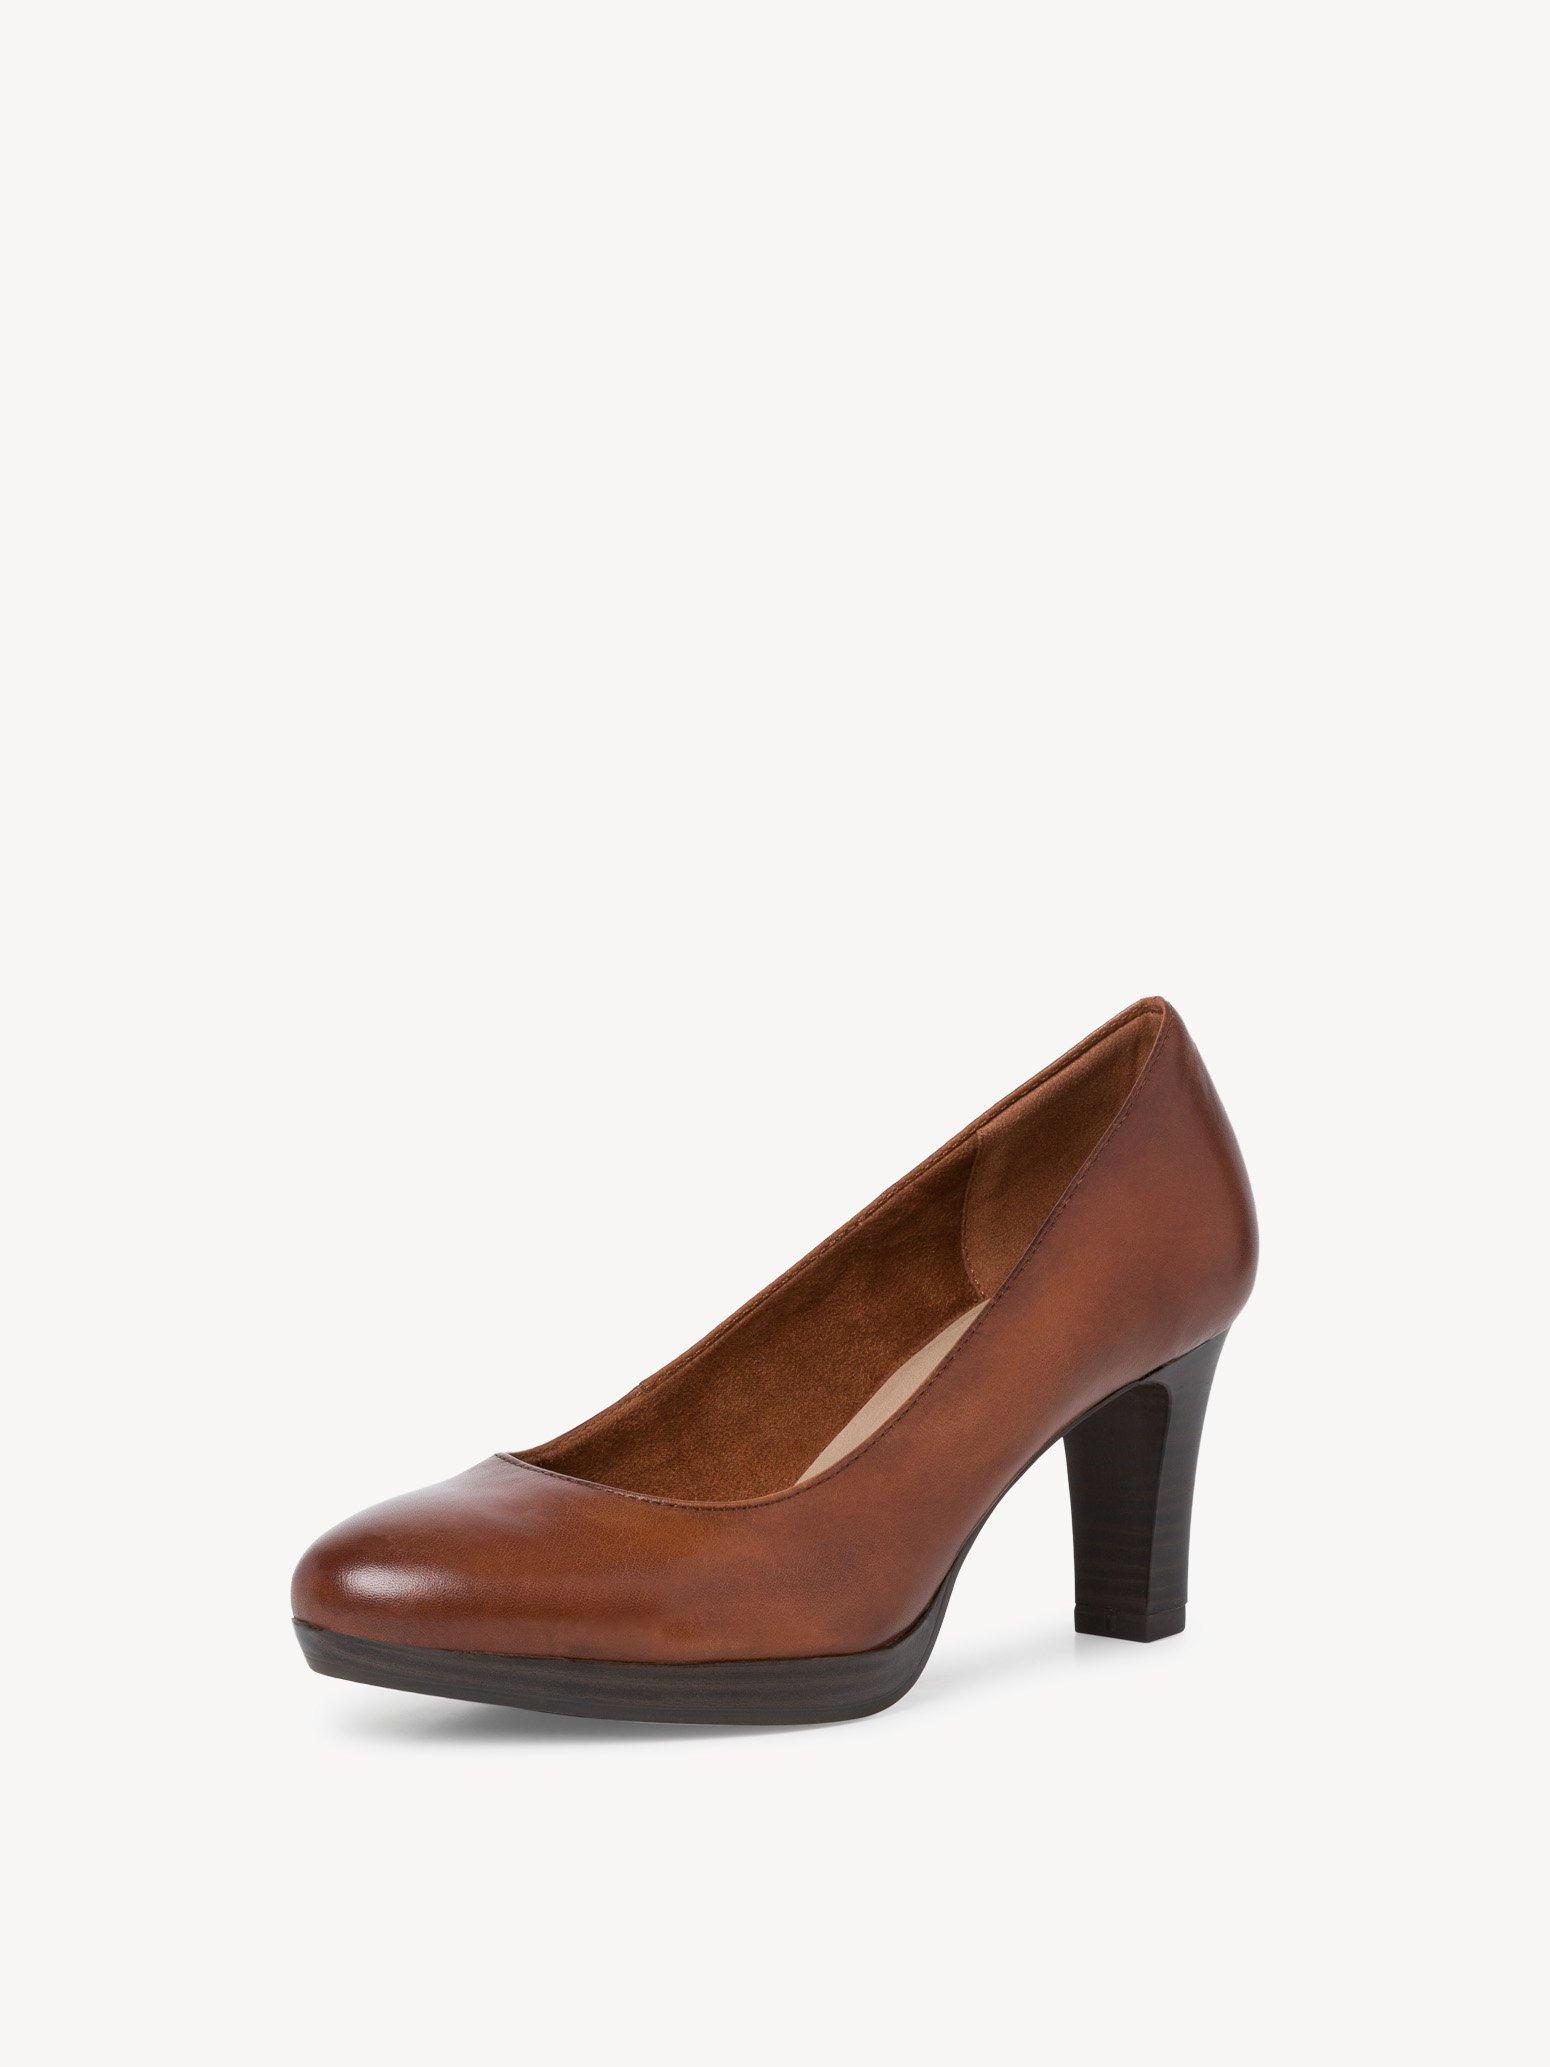 Туфли лодочки Tamaris 1-1-22410-27-305